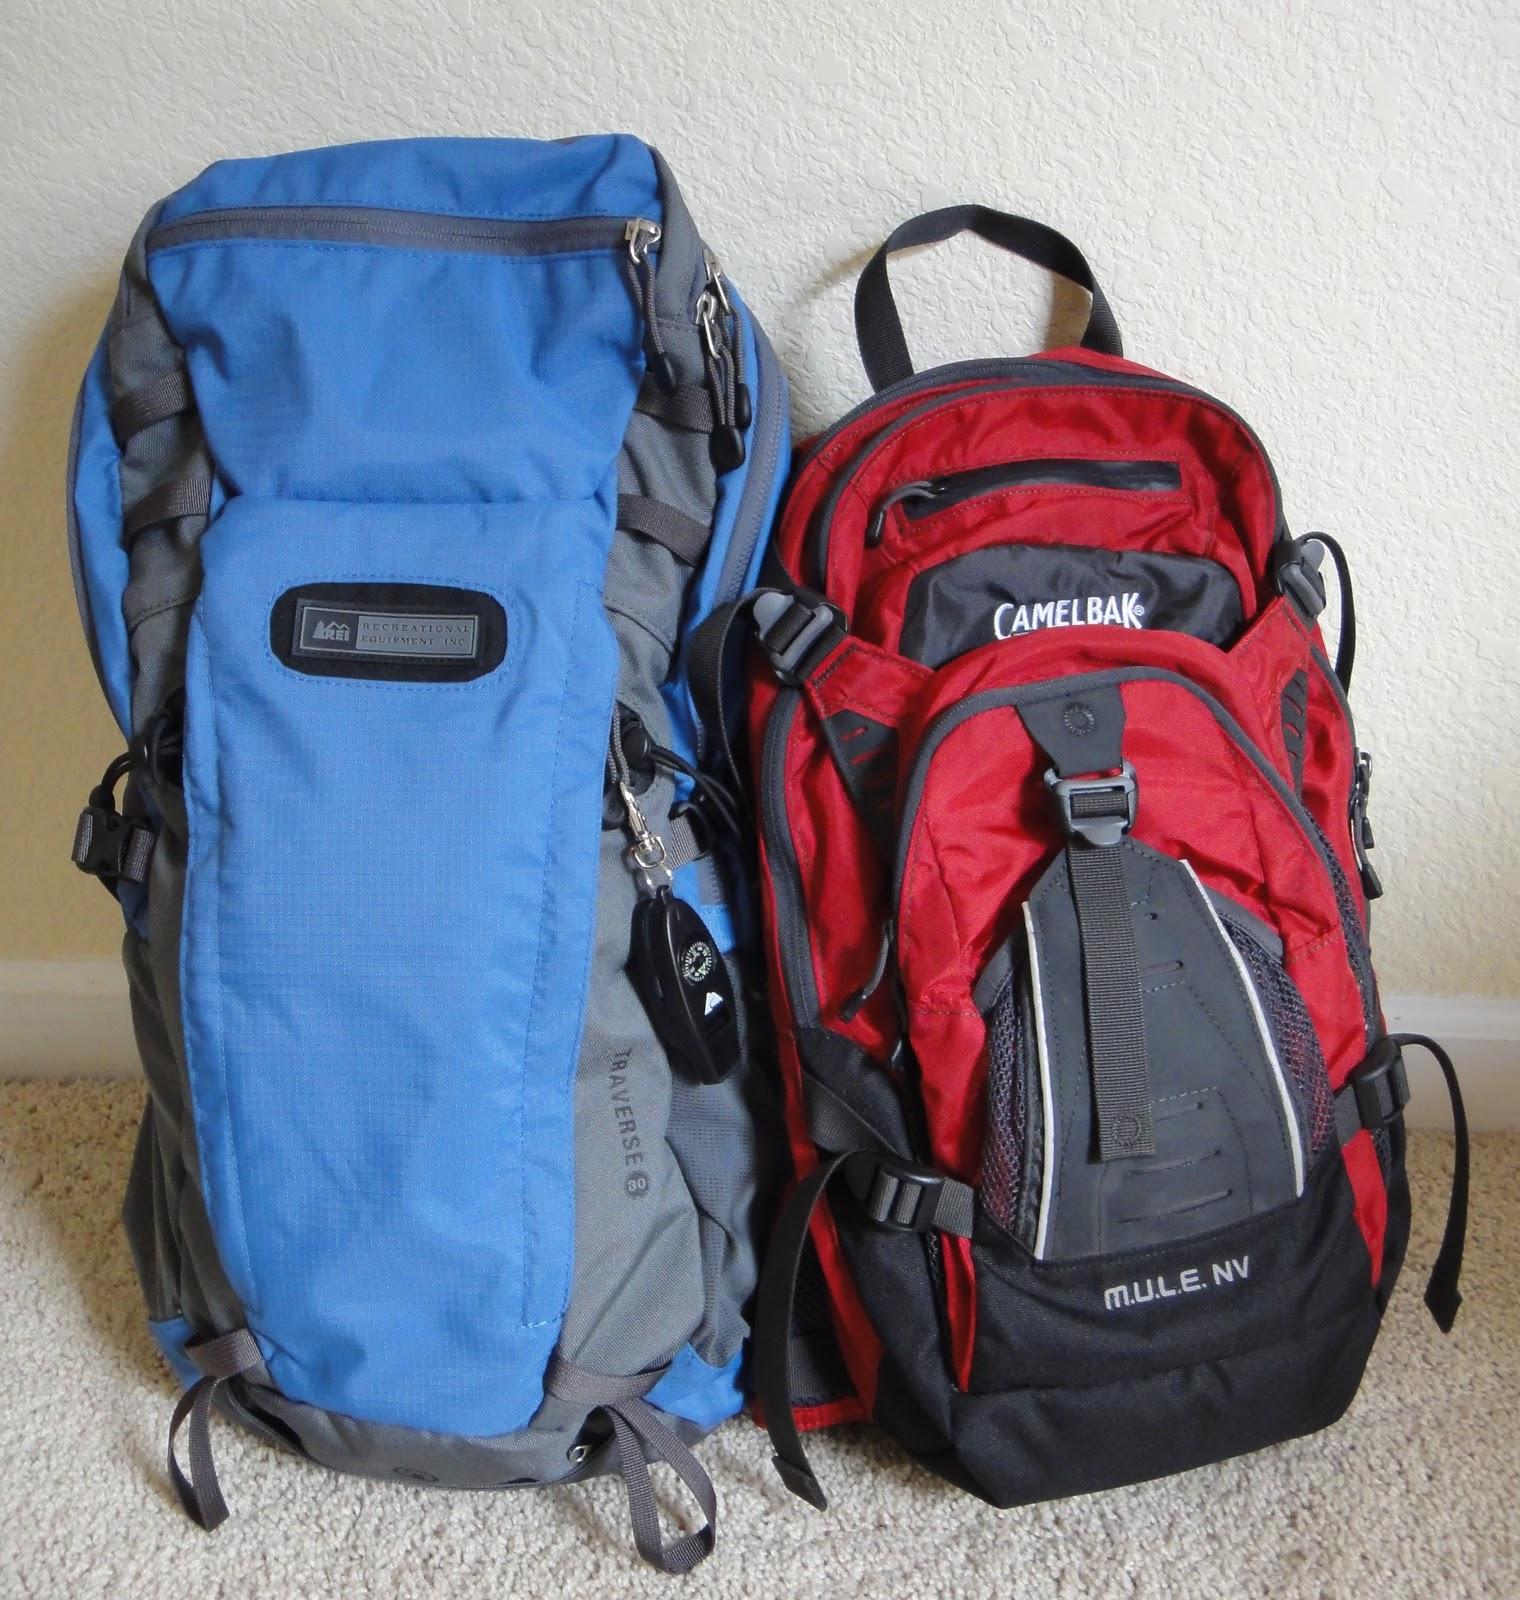 79d517d8bb39 New Shade of Green  Review  REI Traverse 30 Women s Backpack